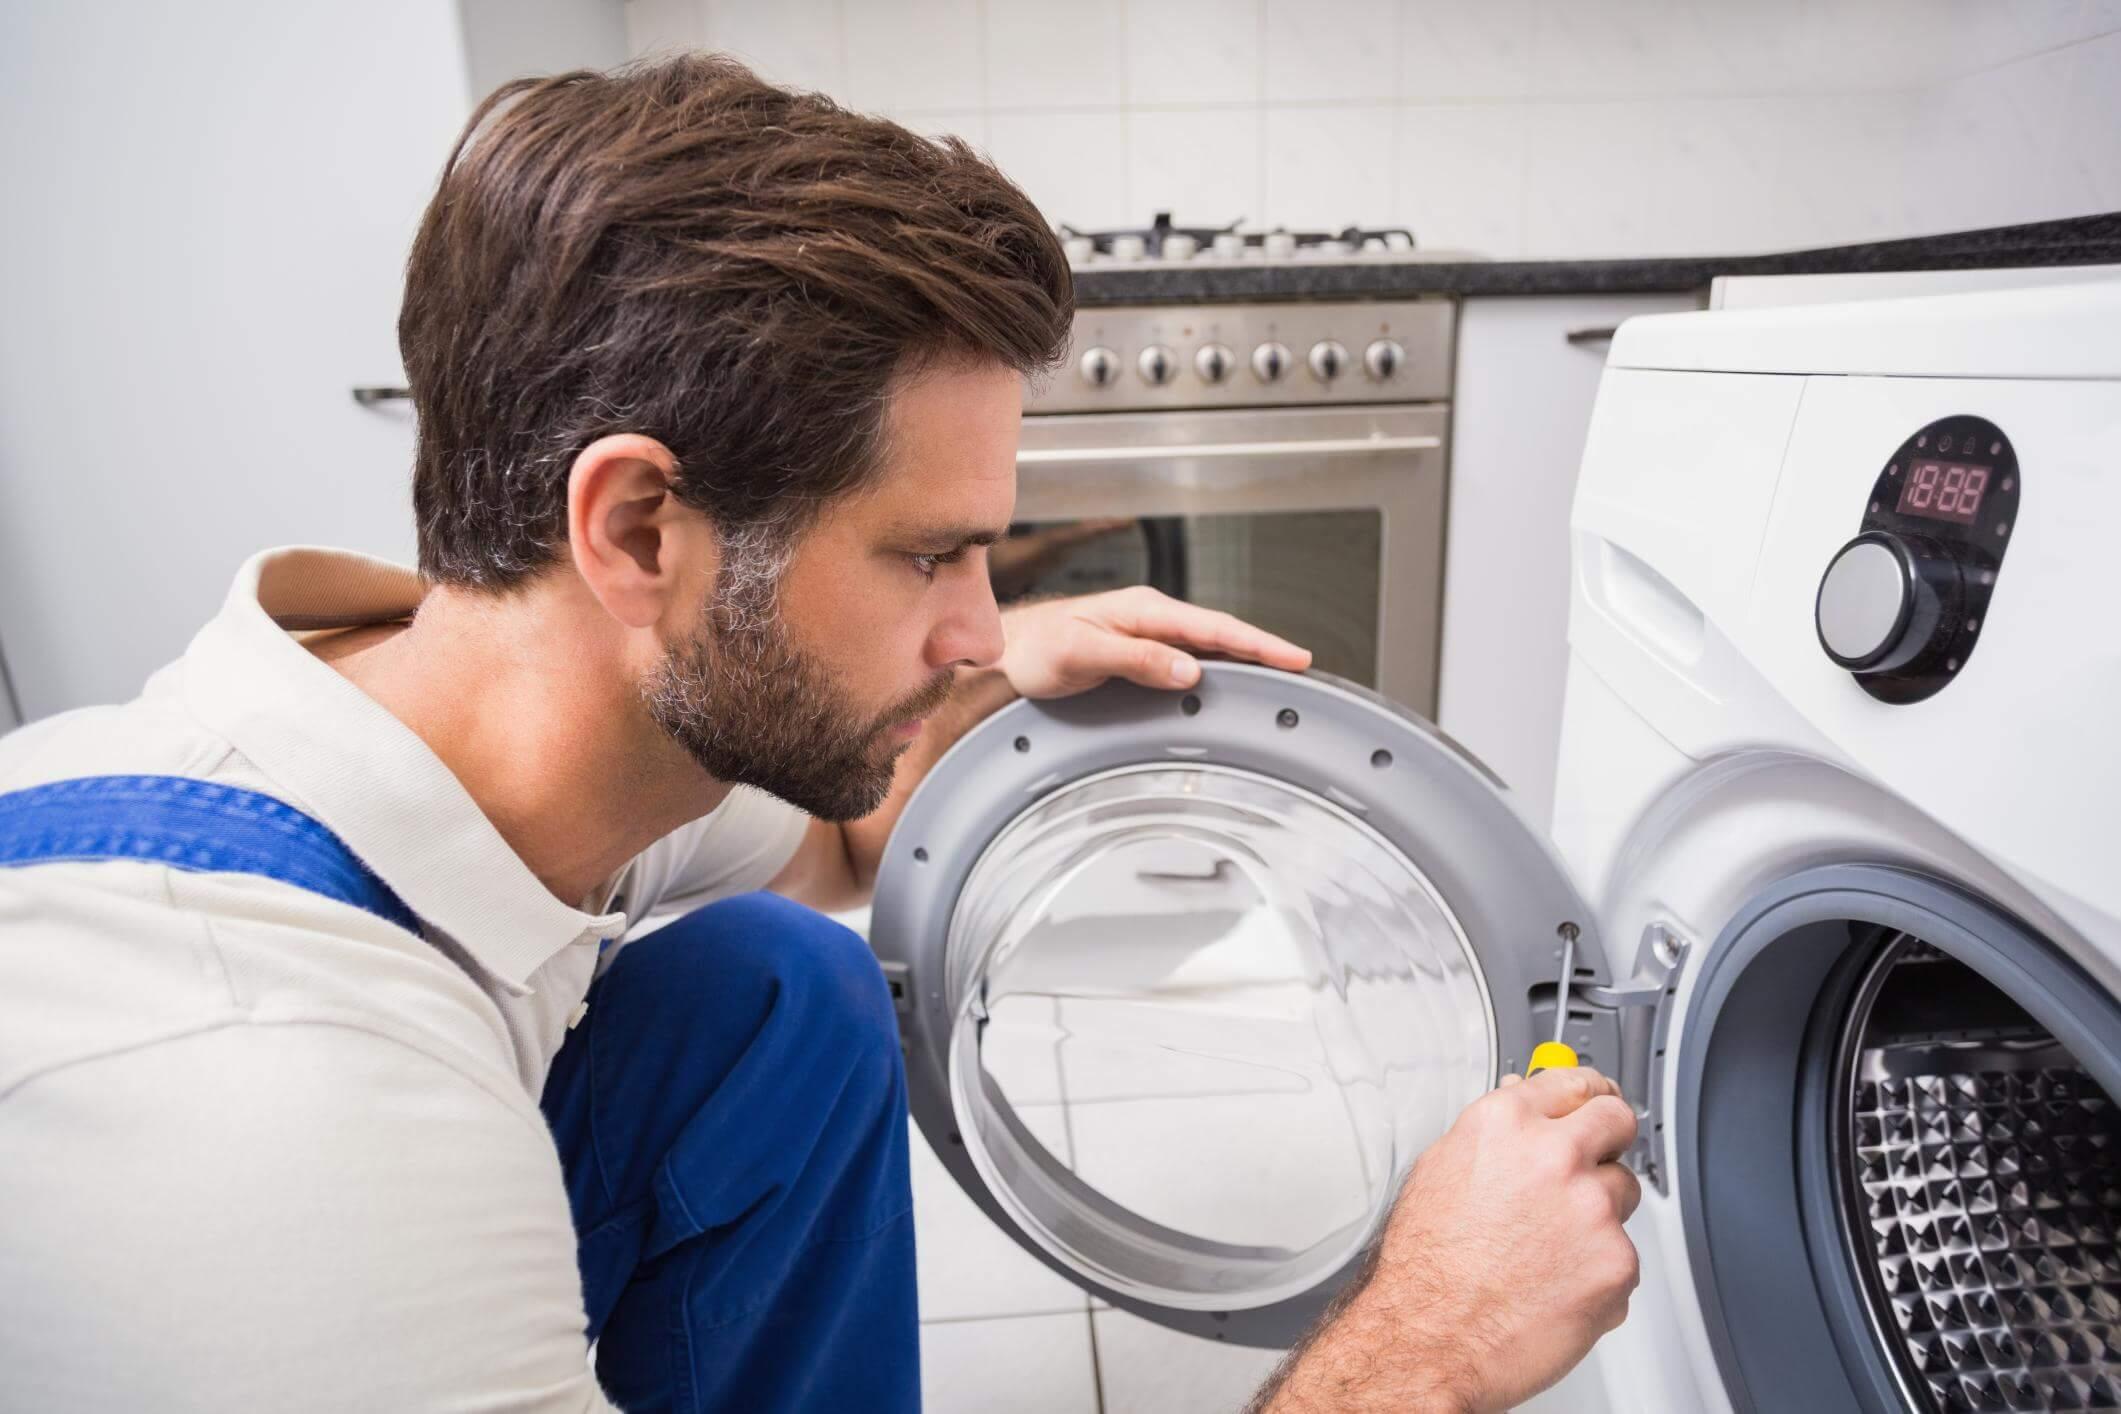 Kitchen – Laundry Technician in Saudi Arabia